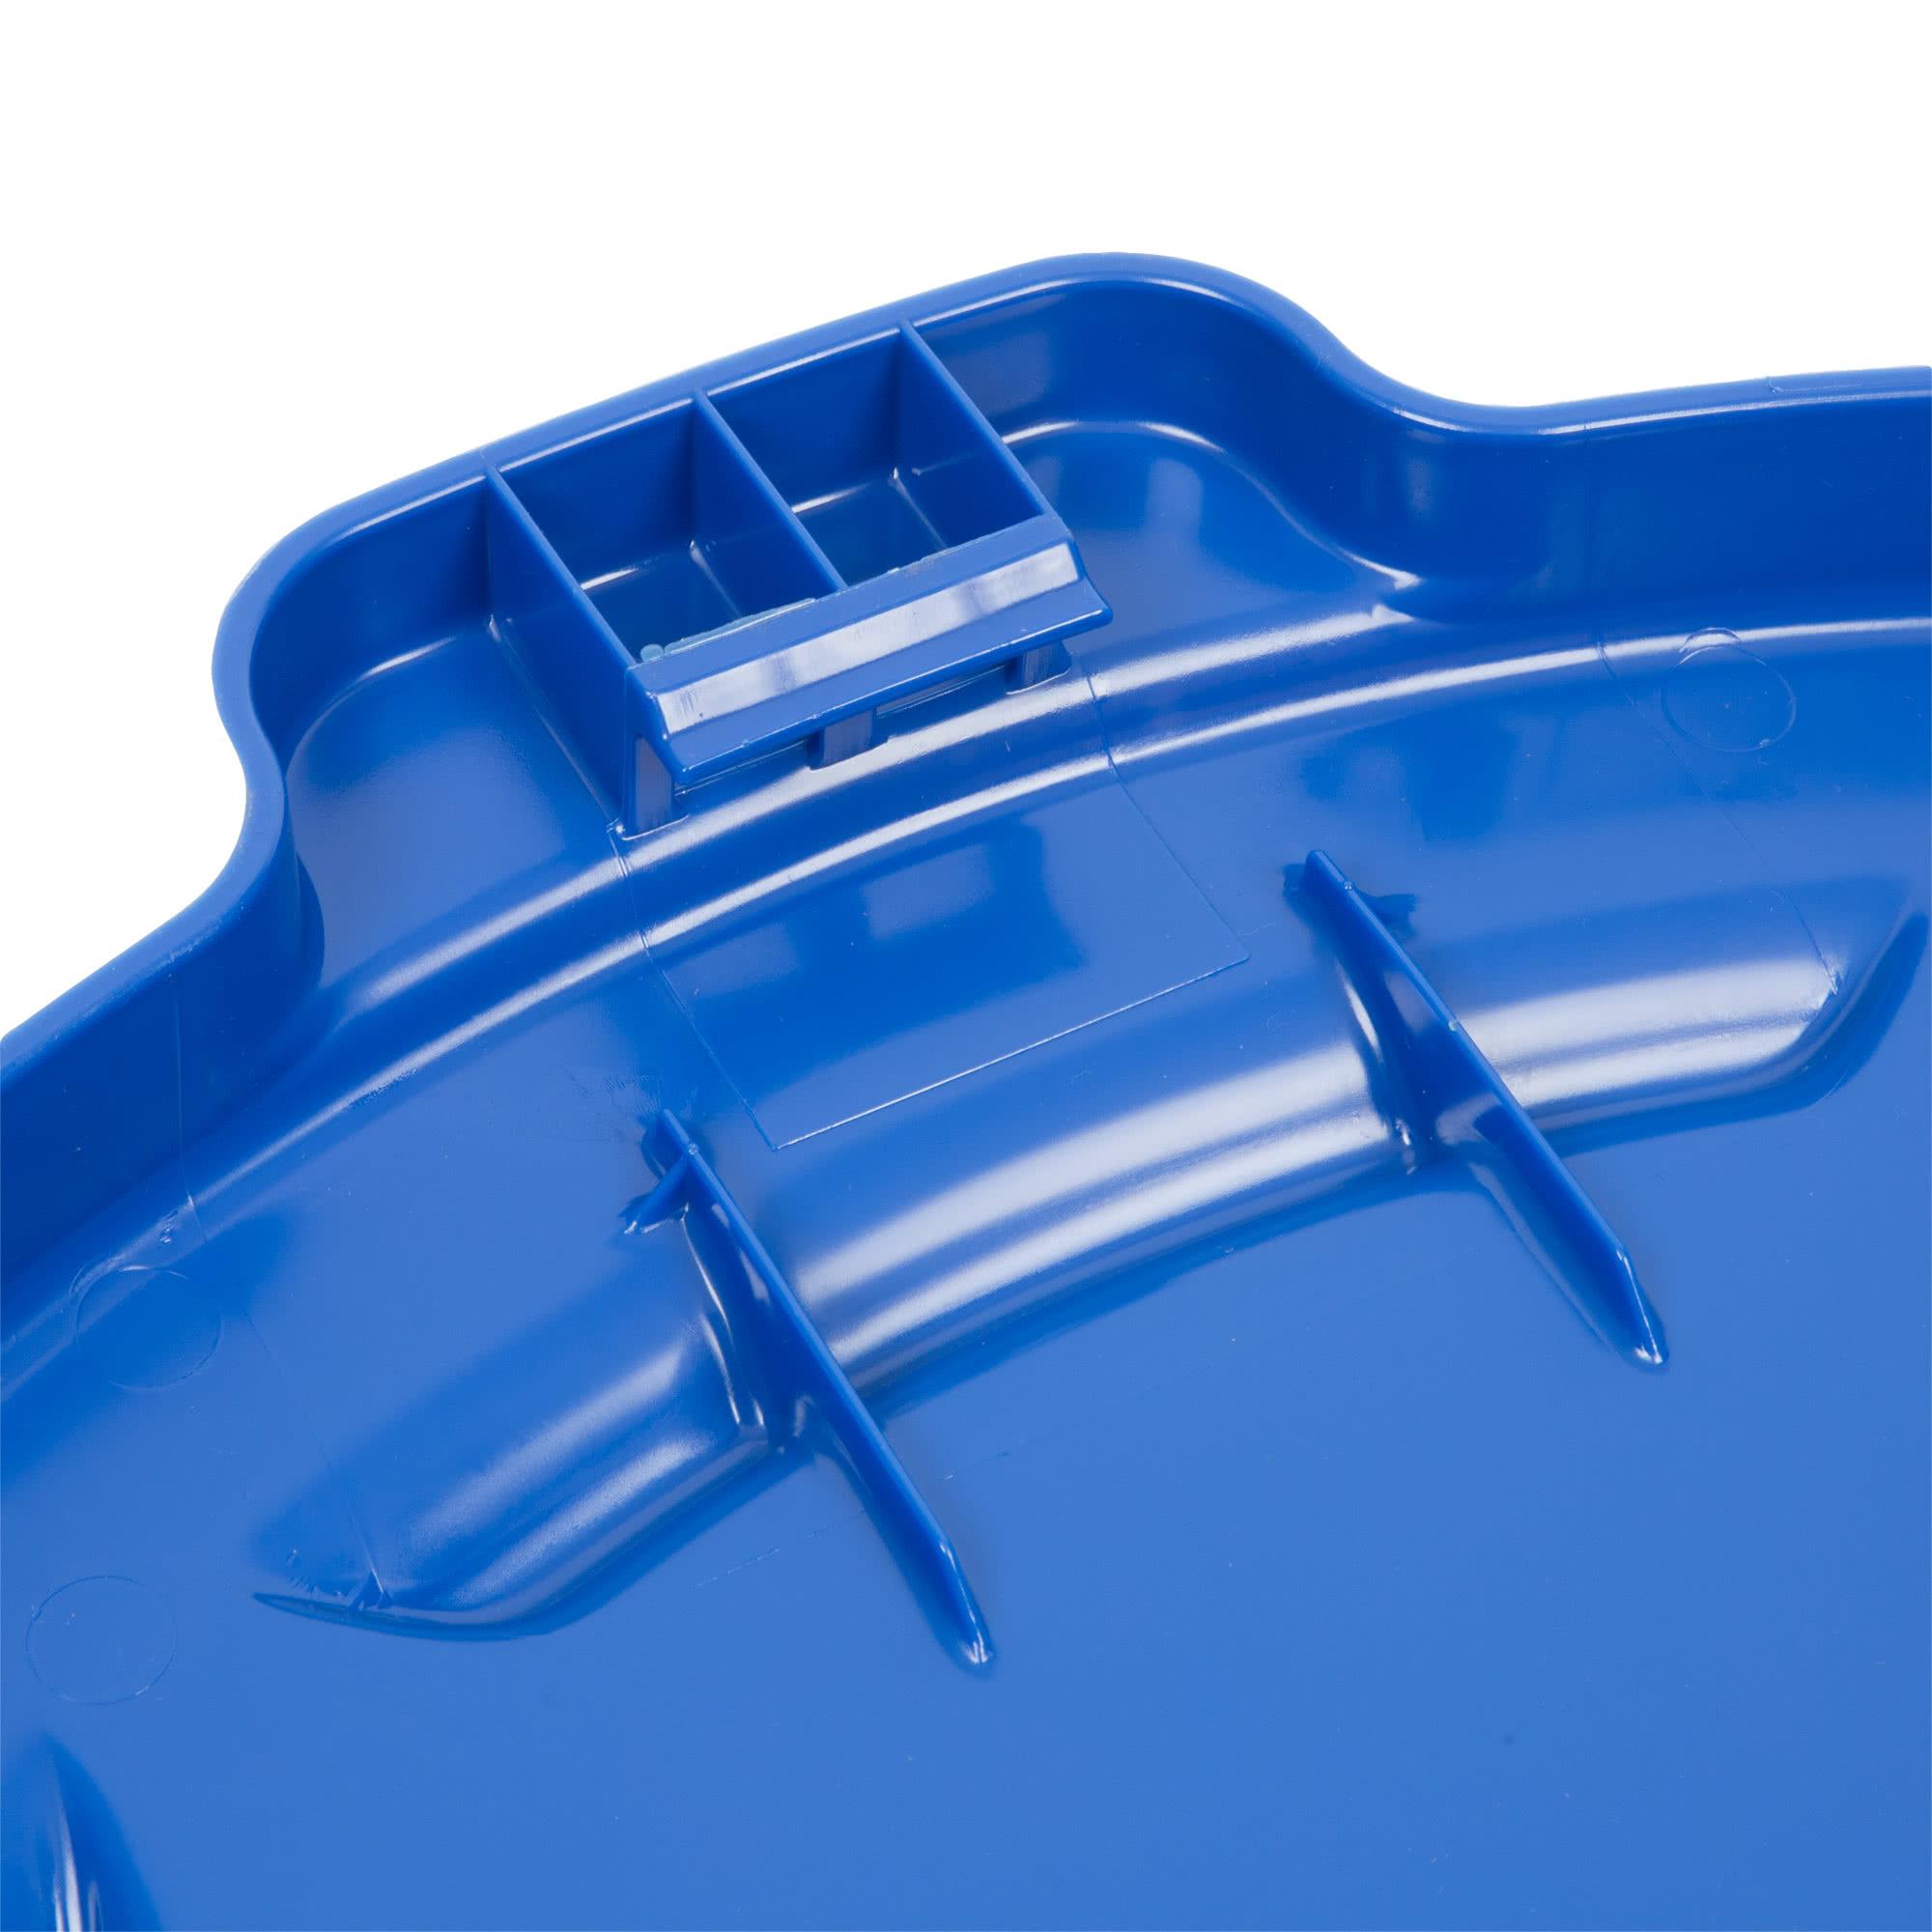 Rubbermaid 1779636 tapa Brute autodrenable color azul, aplica contenedor Brute de 44 galones           3